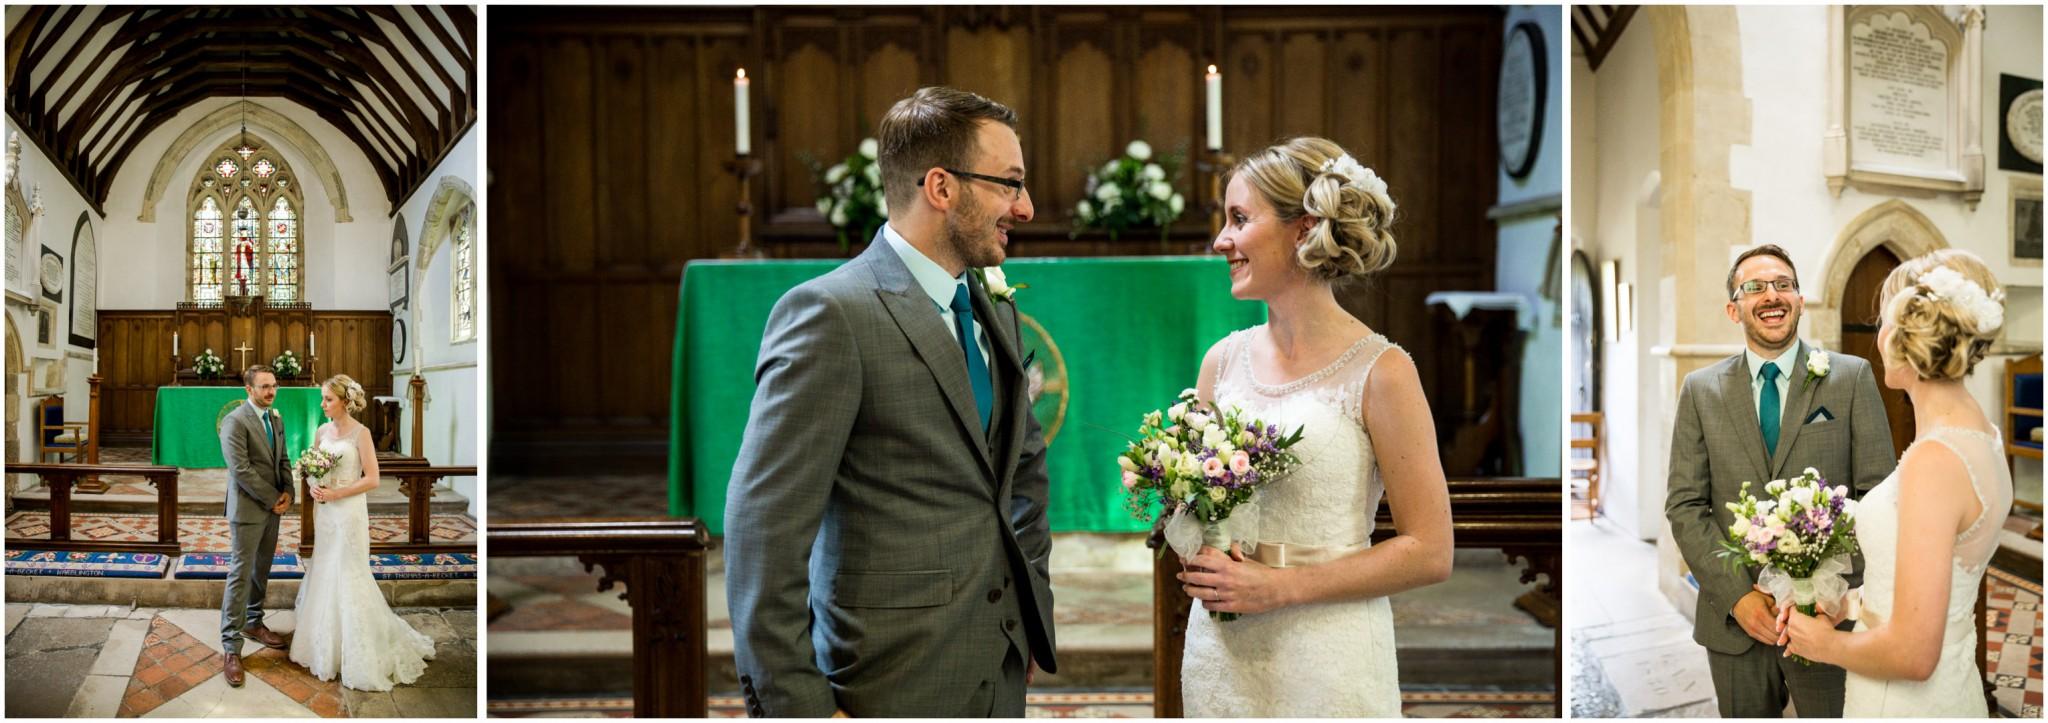 St Thomas a Becket Church Wedding Bride & Groom at altar